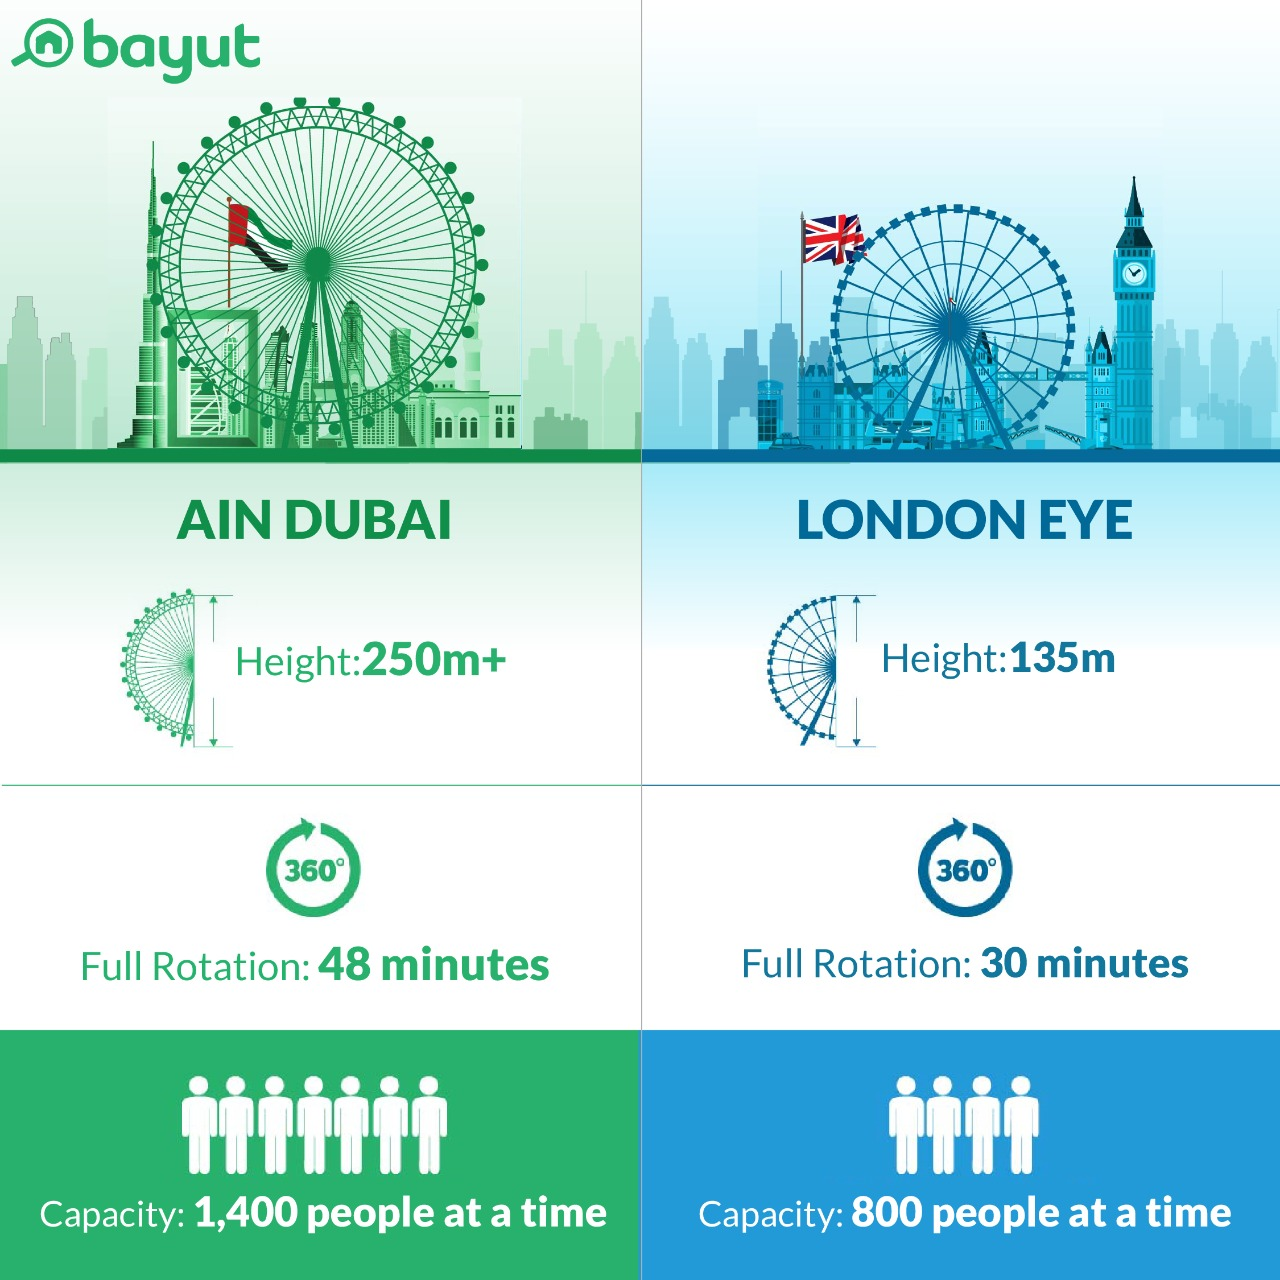 Ain Dubai vs London Eye